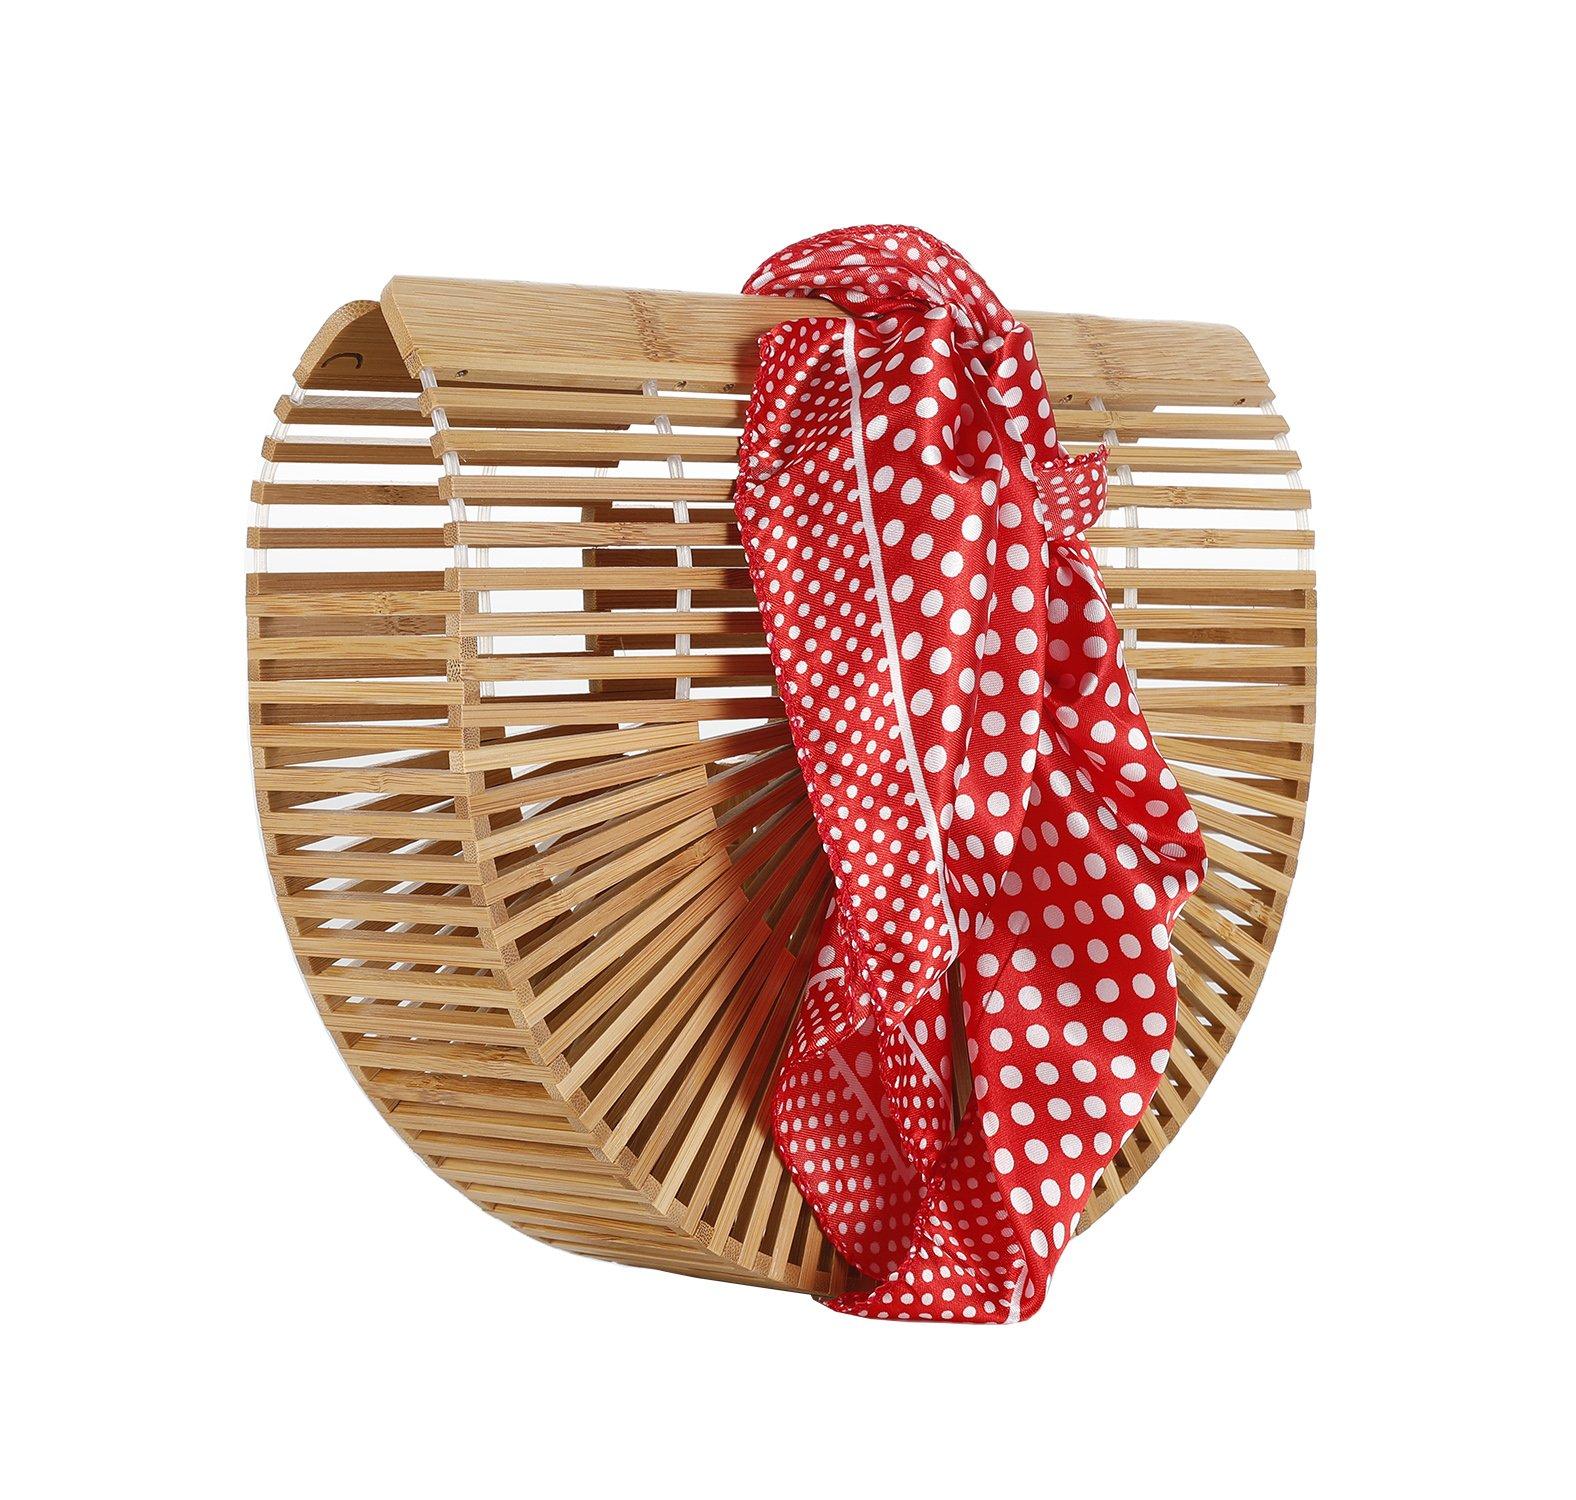 Bamboo Handbag Bamboo Ark bag Clutch Ladies Tote Bags(style 3-bamboo handbag)